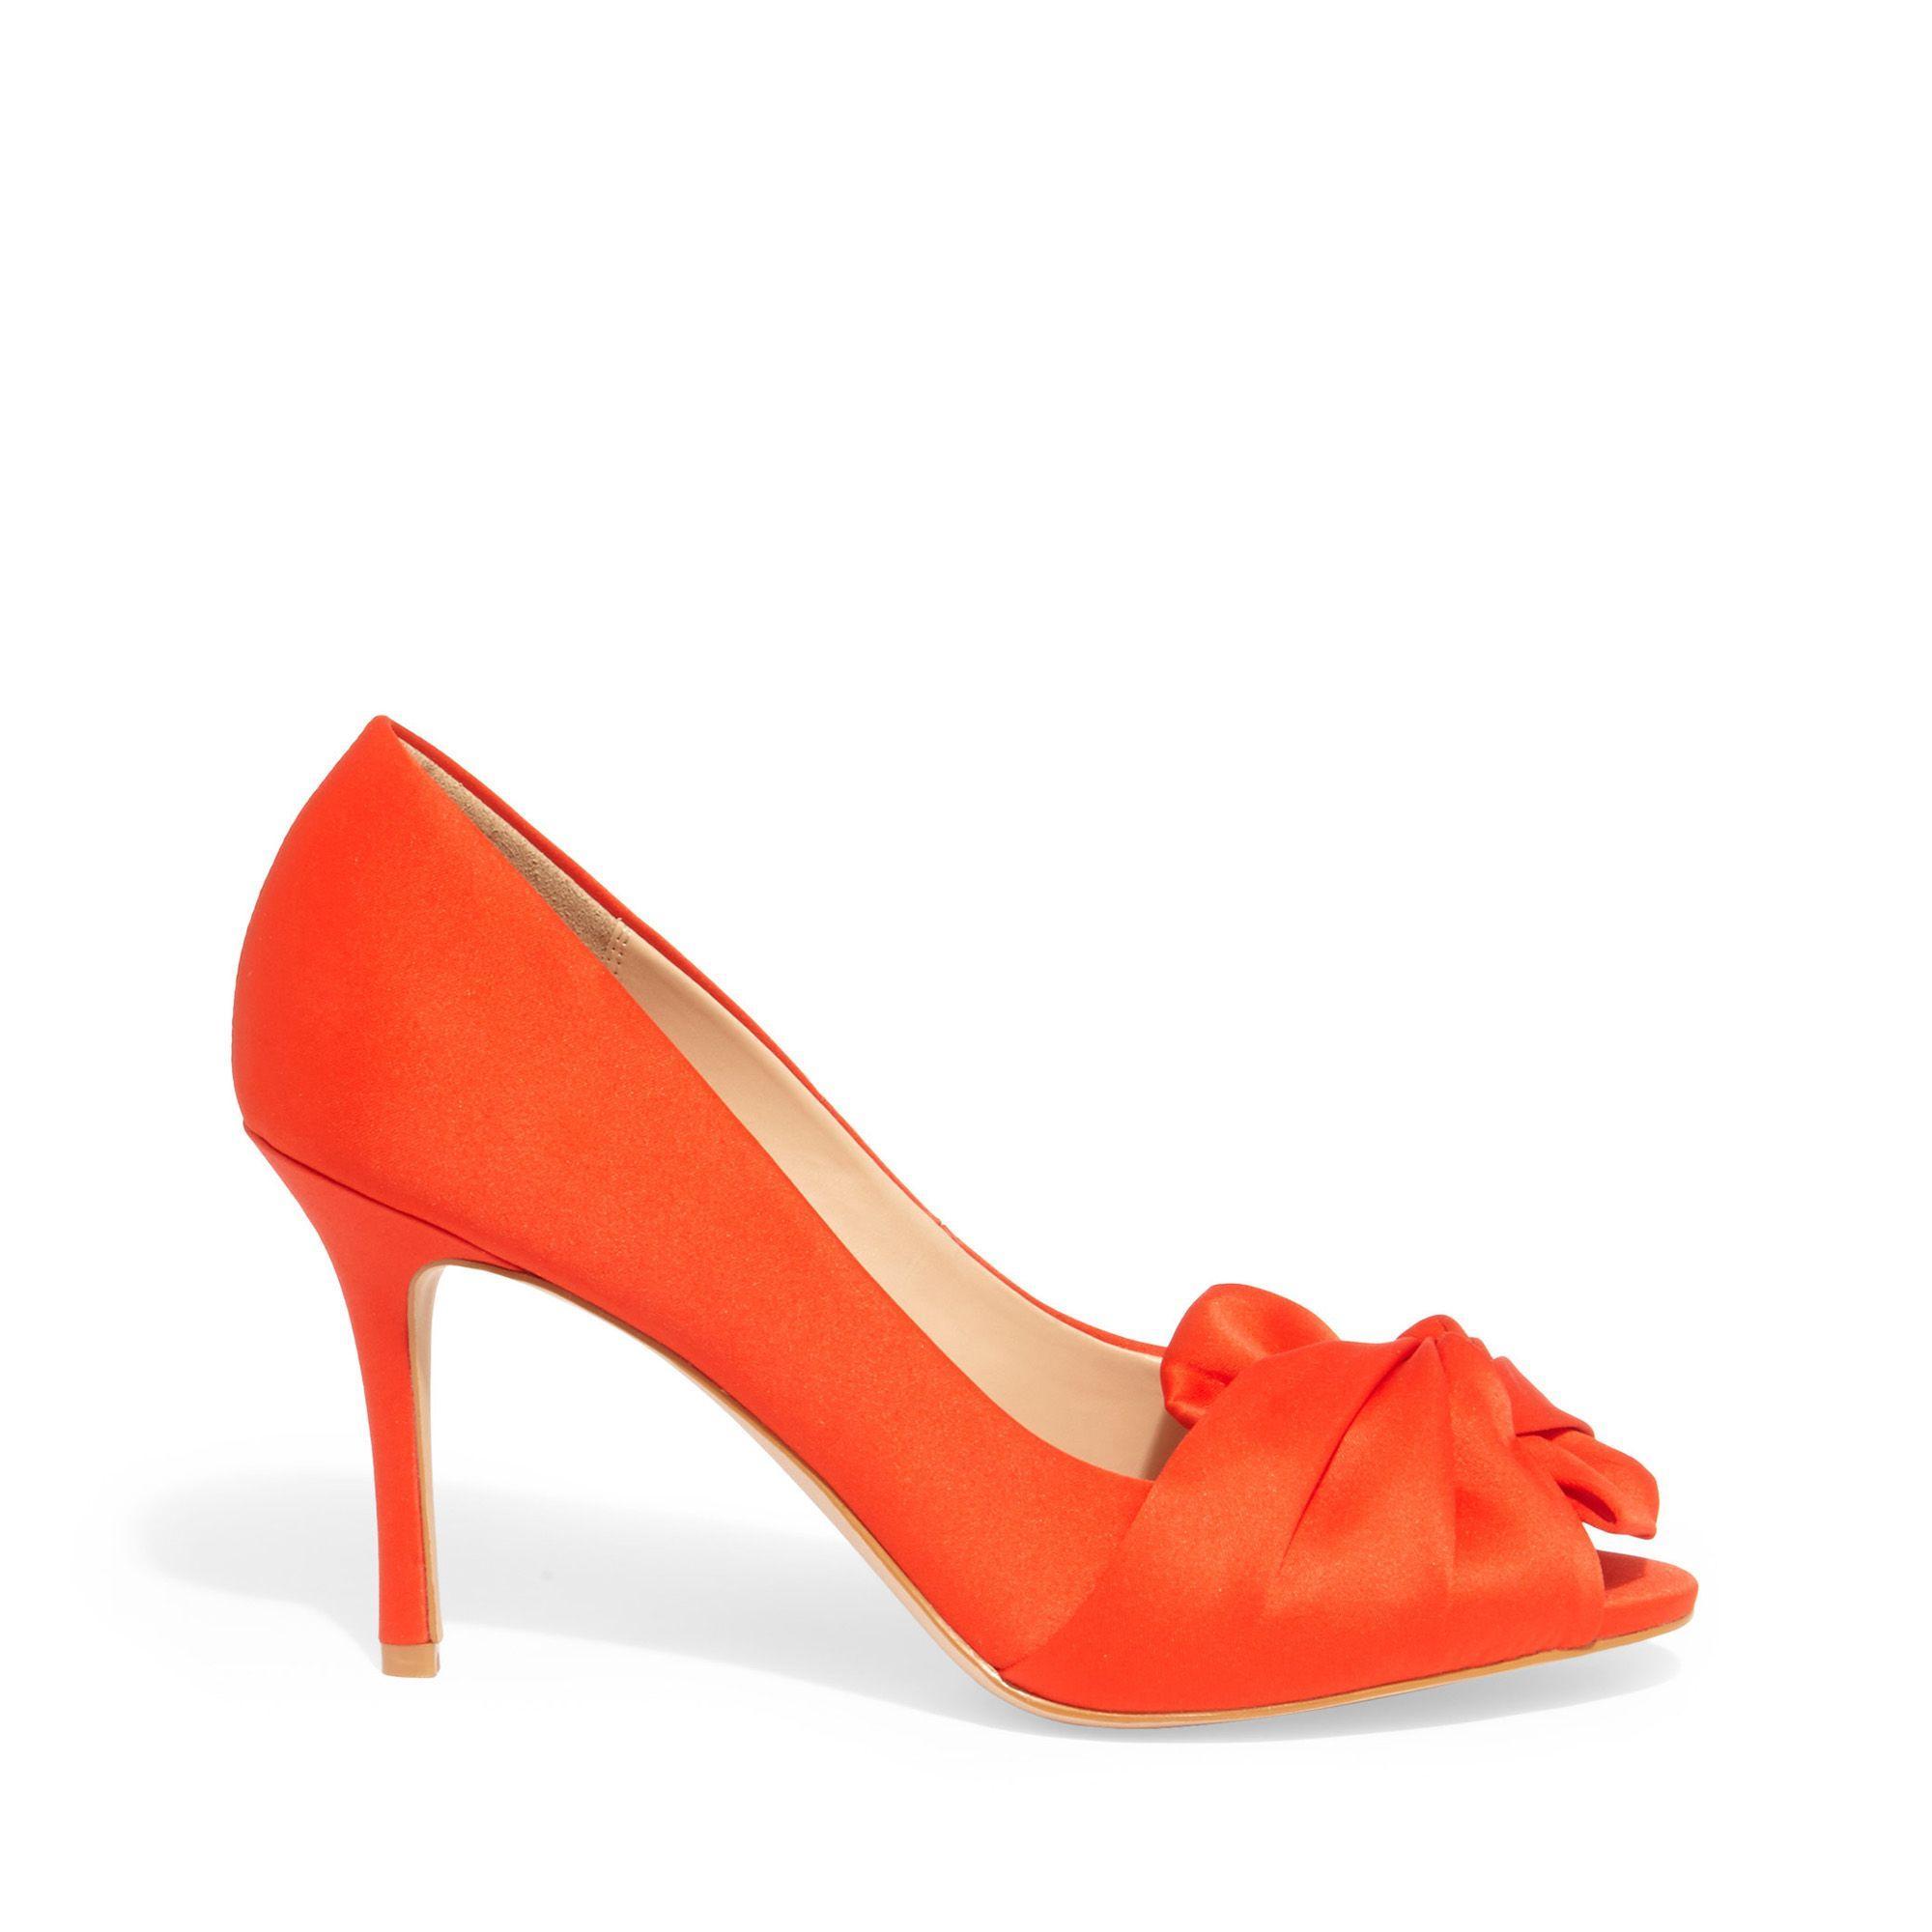 d497a080da Phase Eight Orange Alice Satin Bow Peep Toe Shoes in Orange - Lyst